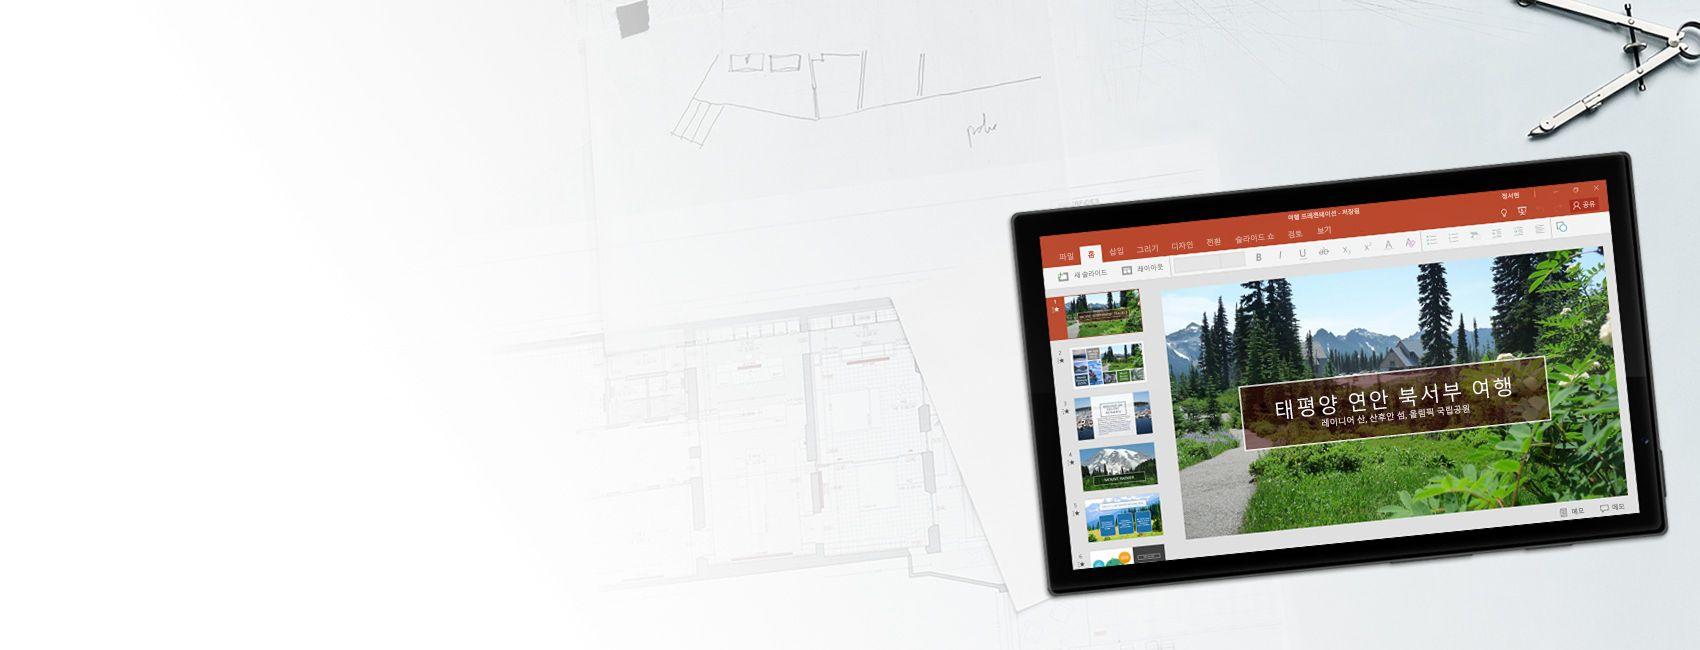 Windows 10 Mobile용 PowerPoint에 태평양 연안 북서부 여행에 대한 PowerPoint 프레젠테이션이 표시된 Windows 태블릿